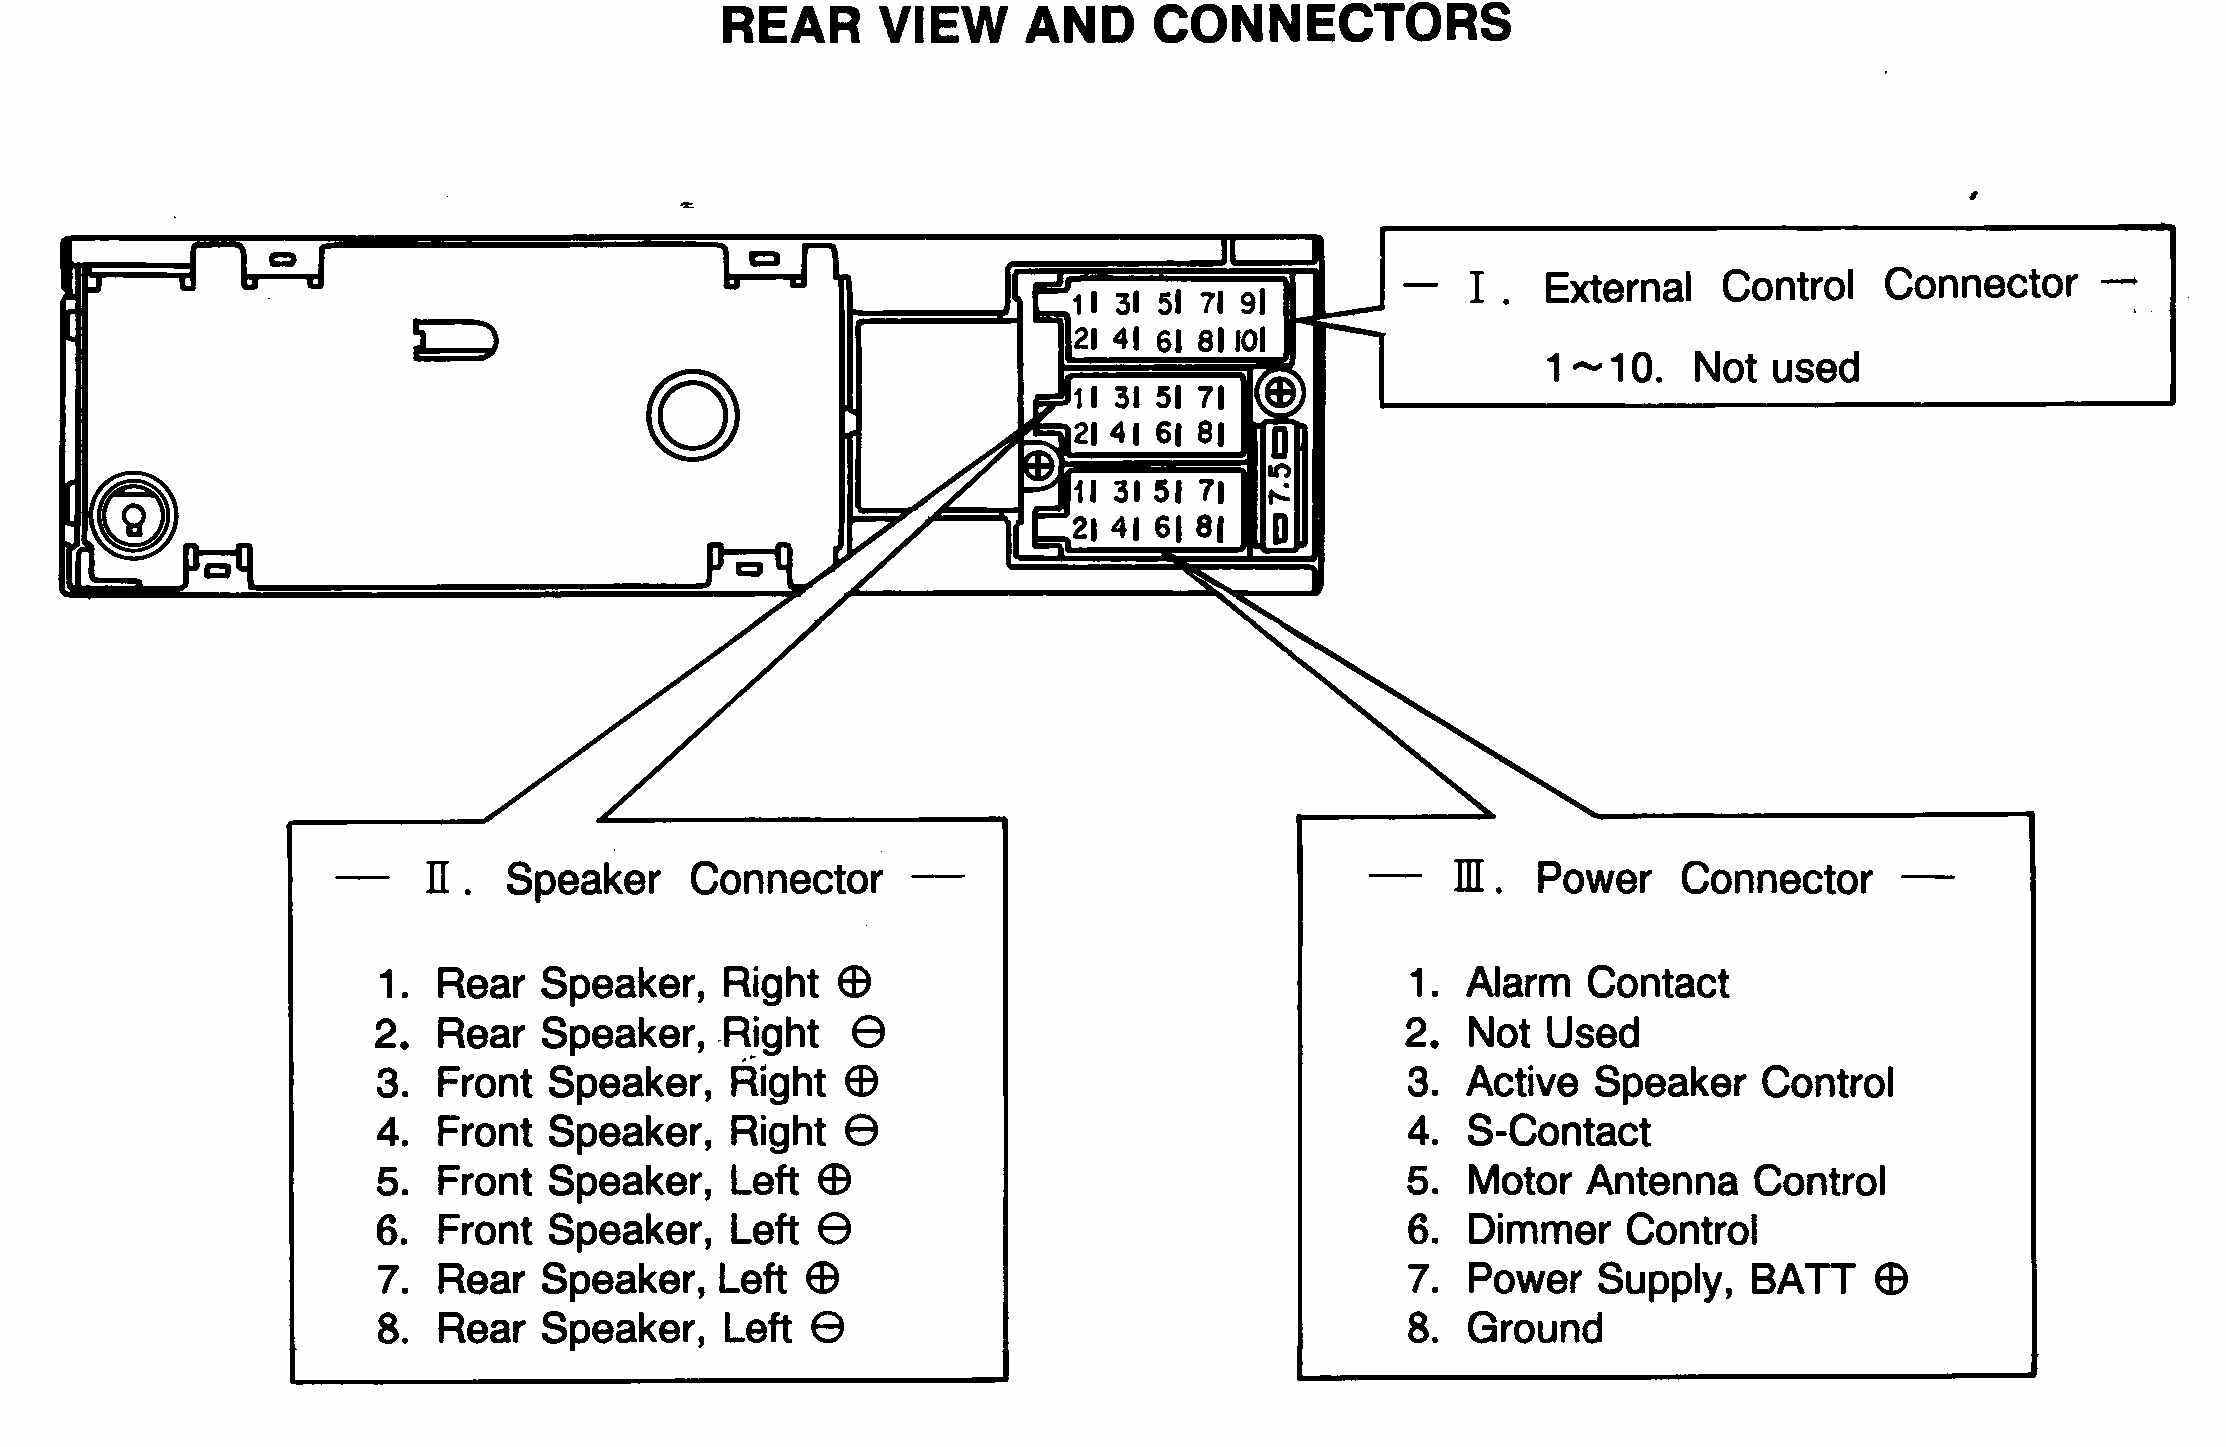 Sony Car Stereo Wiring Diagram - Data Wiring Diagram Today - Sony Car Stereo Wiring Diagram